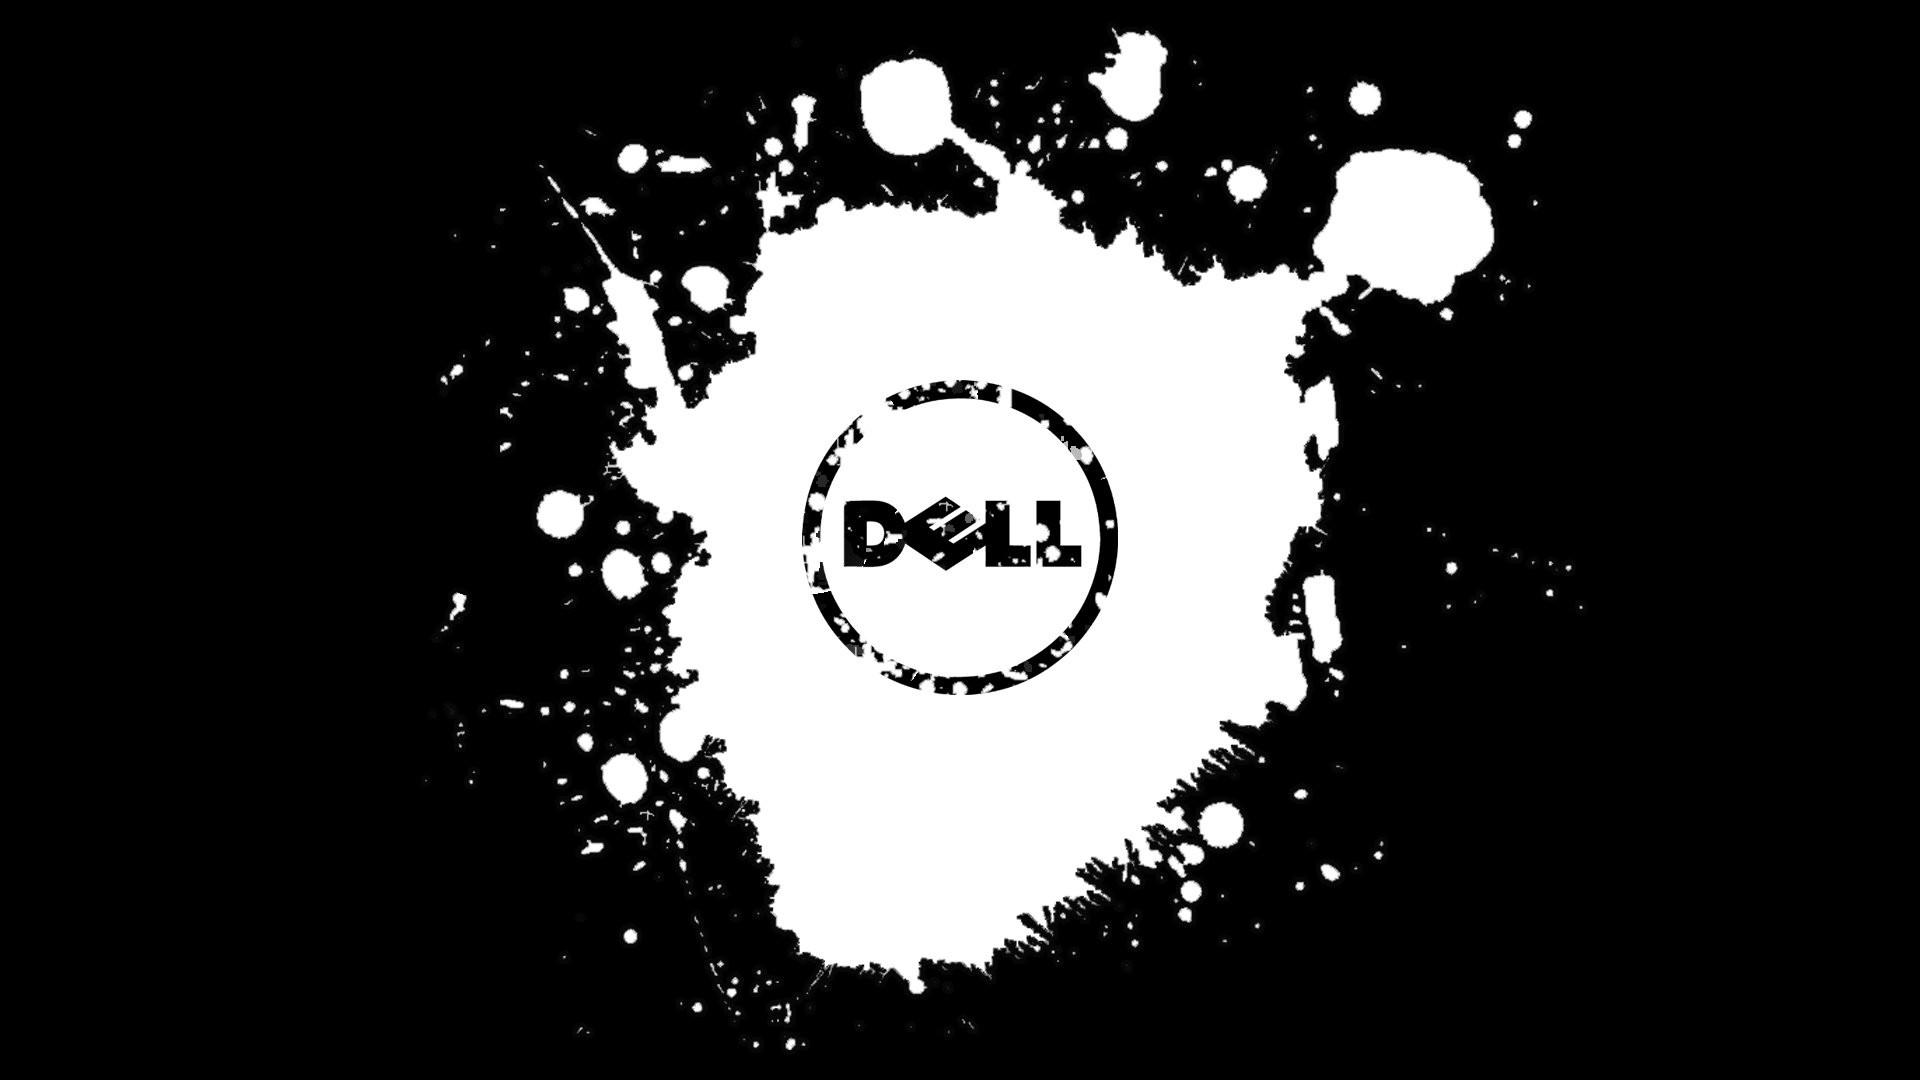 Technology – Dell Wallpaper